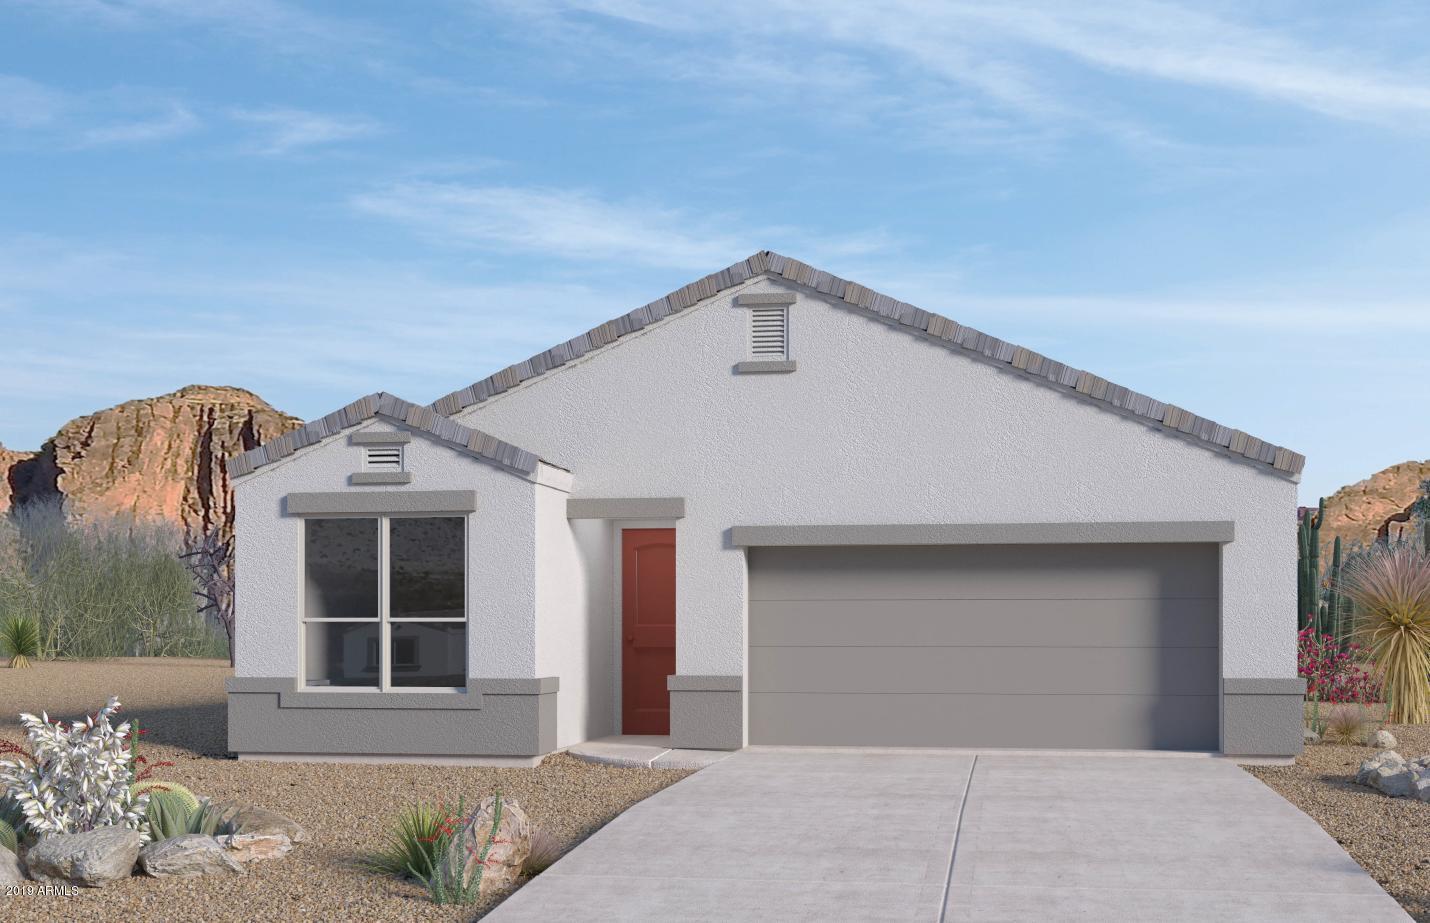 Photo of 24126 N 20th Place, Phoenix, AZ 85024